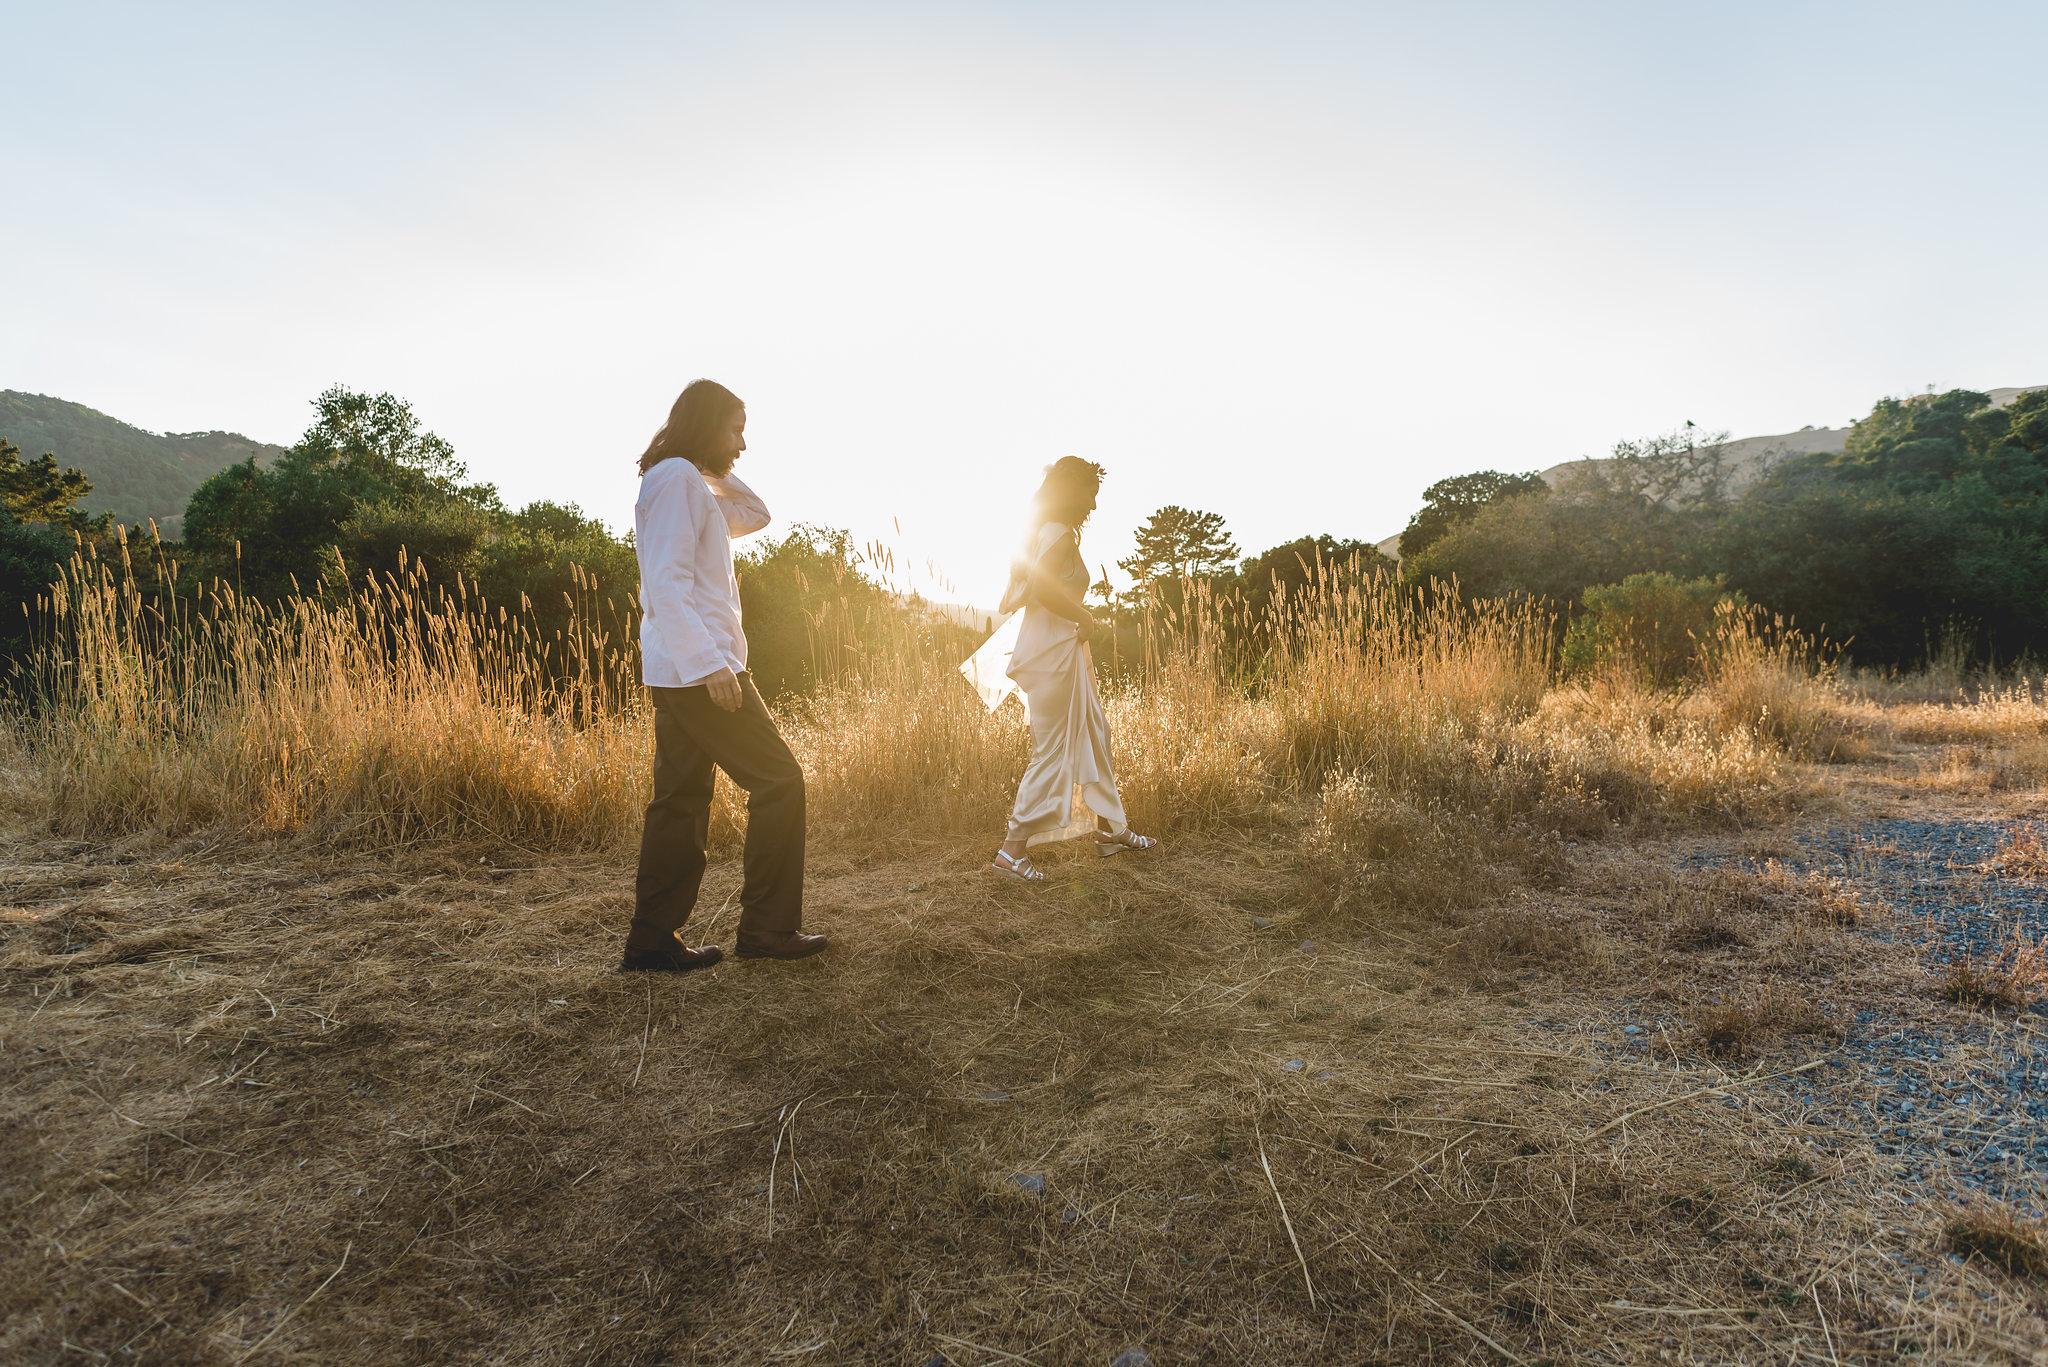 kn-wedding-couples-portraits-29.jpg